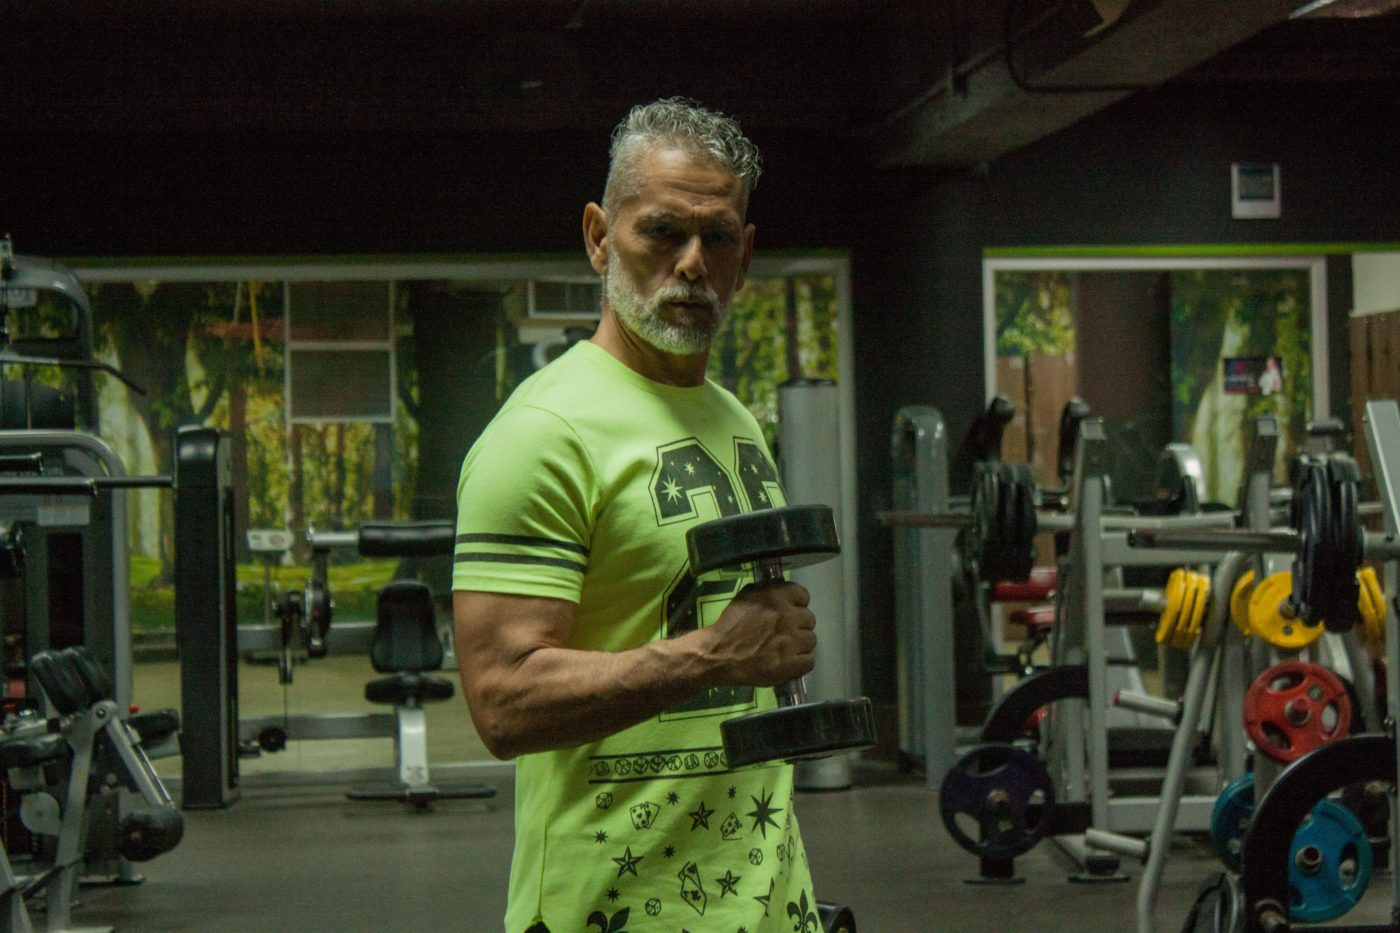 Older man lifting a dumbbell